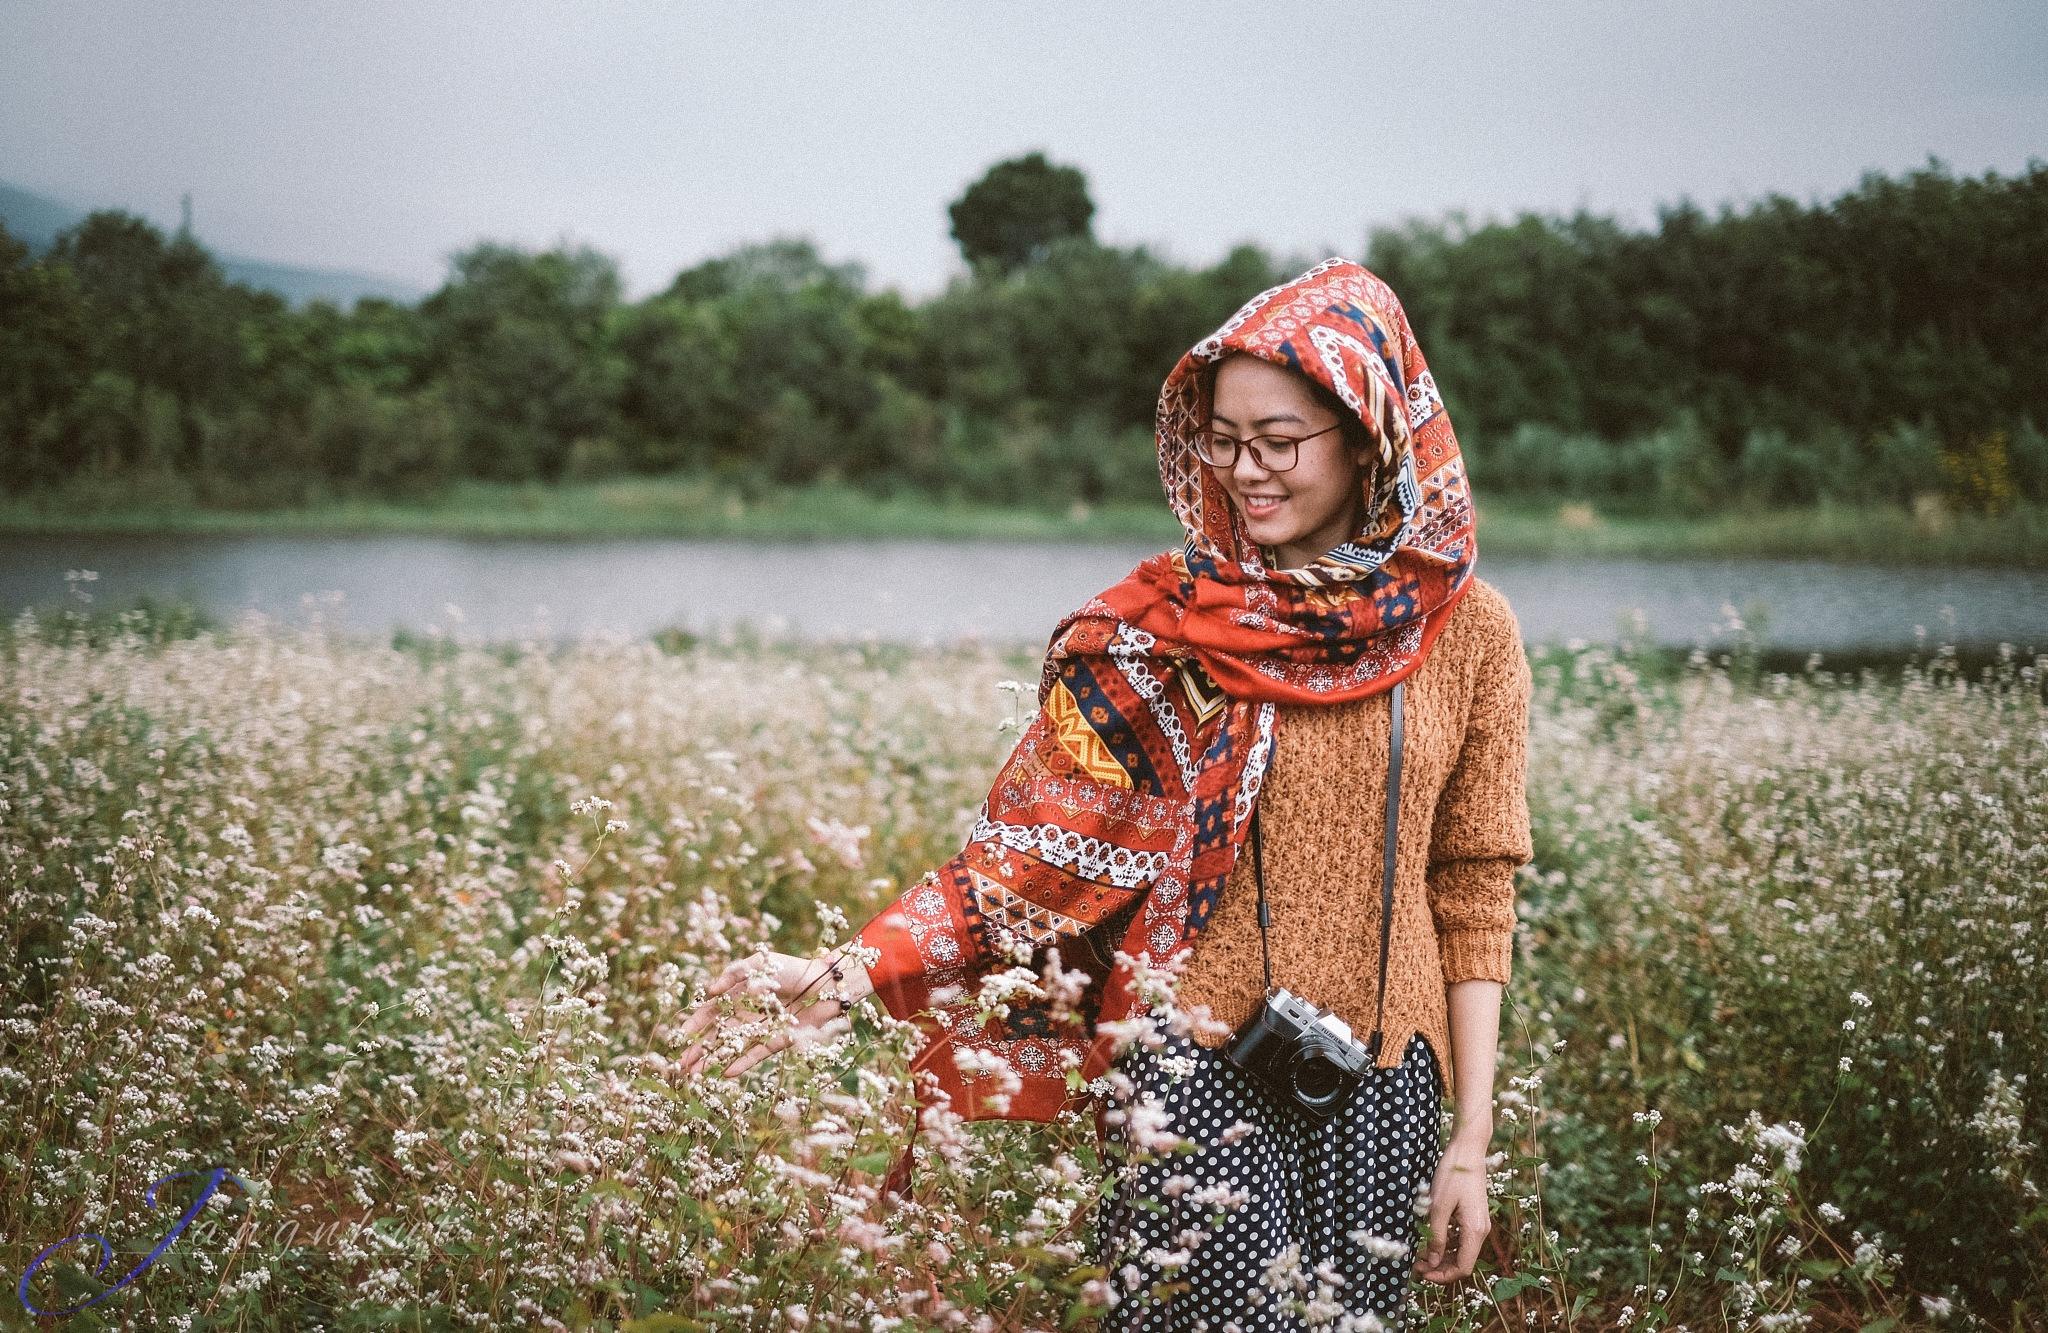 Smile girl by Jangnhut